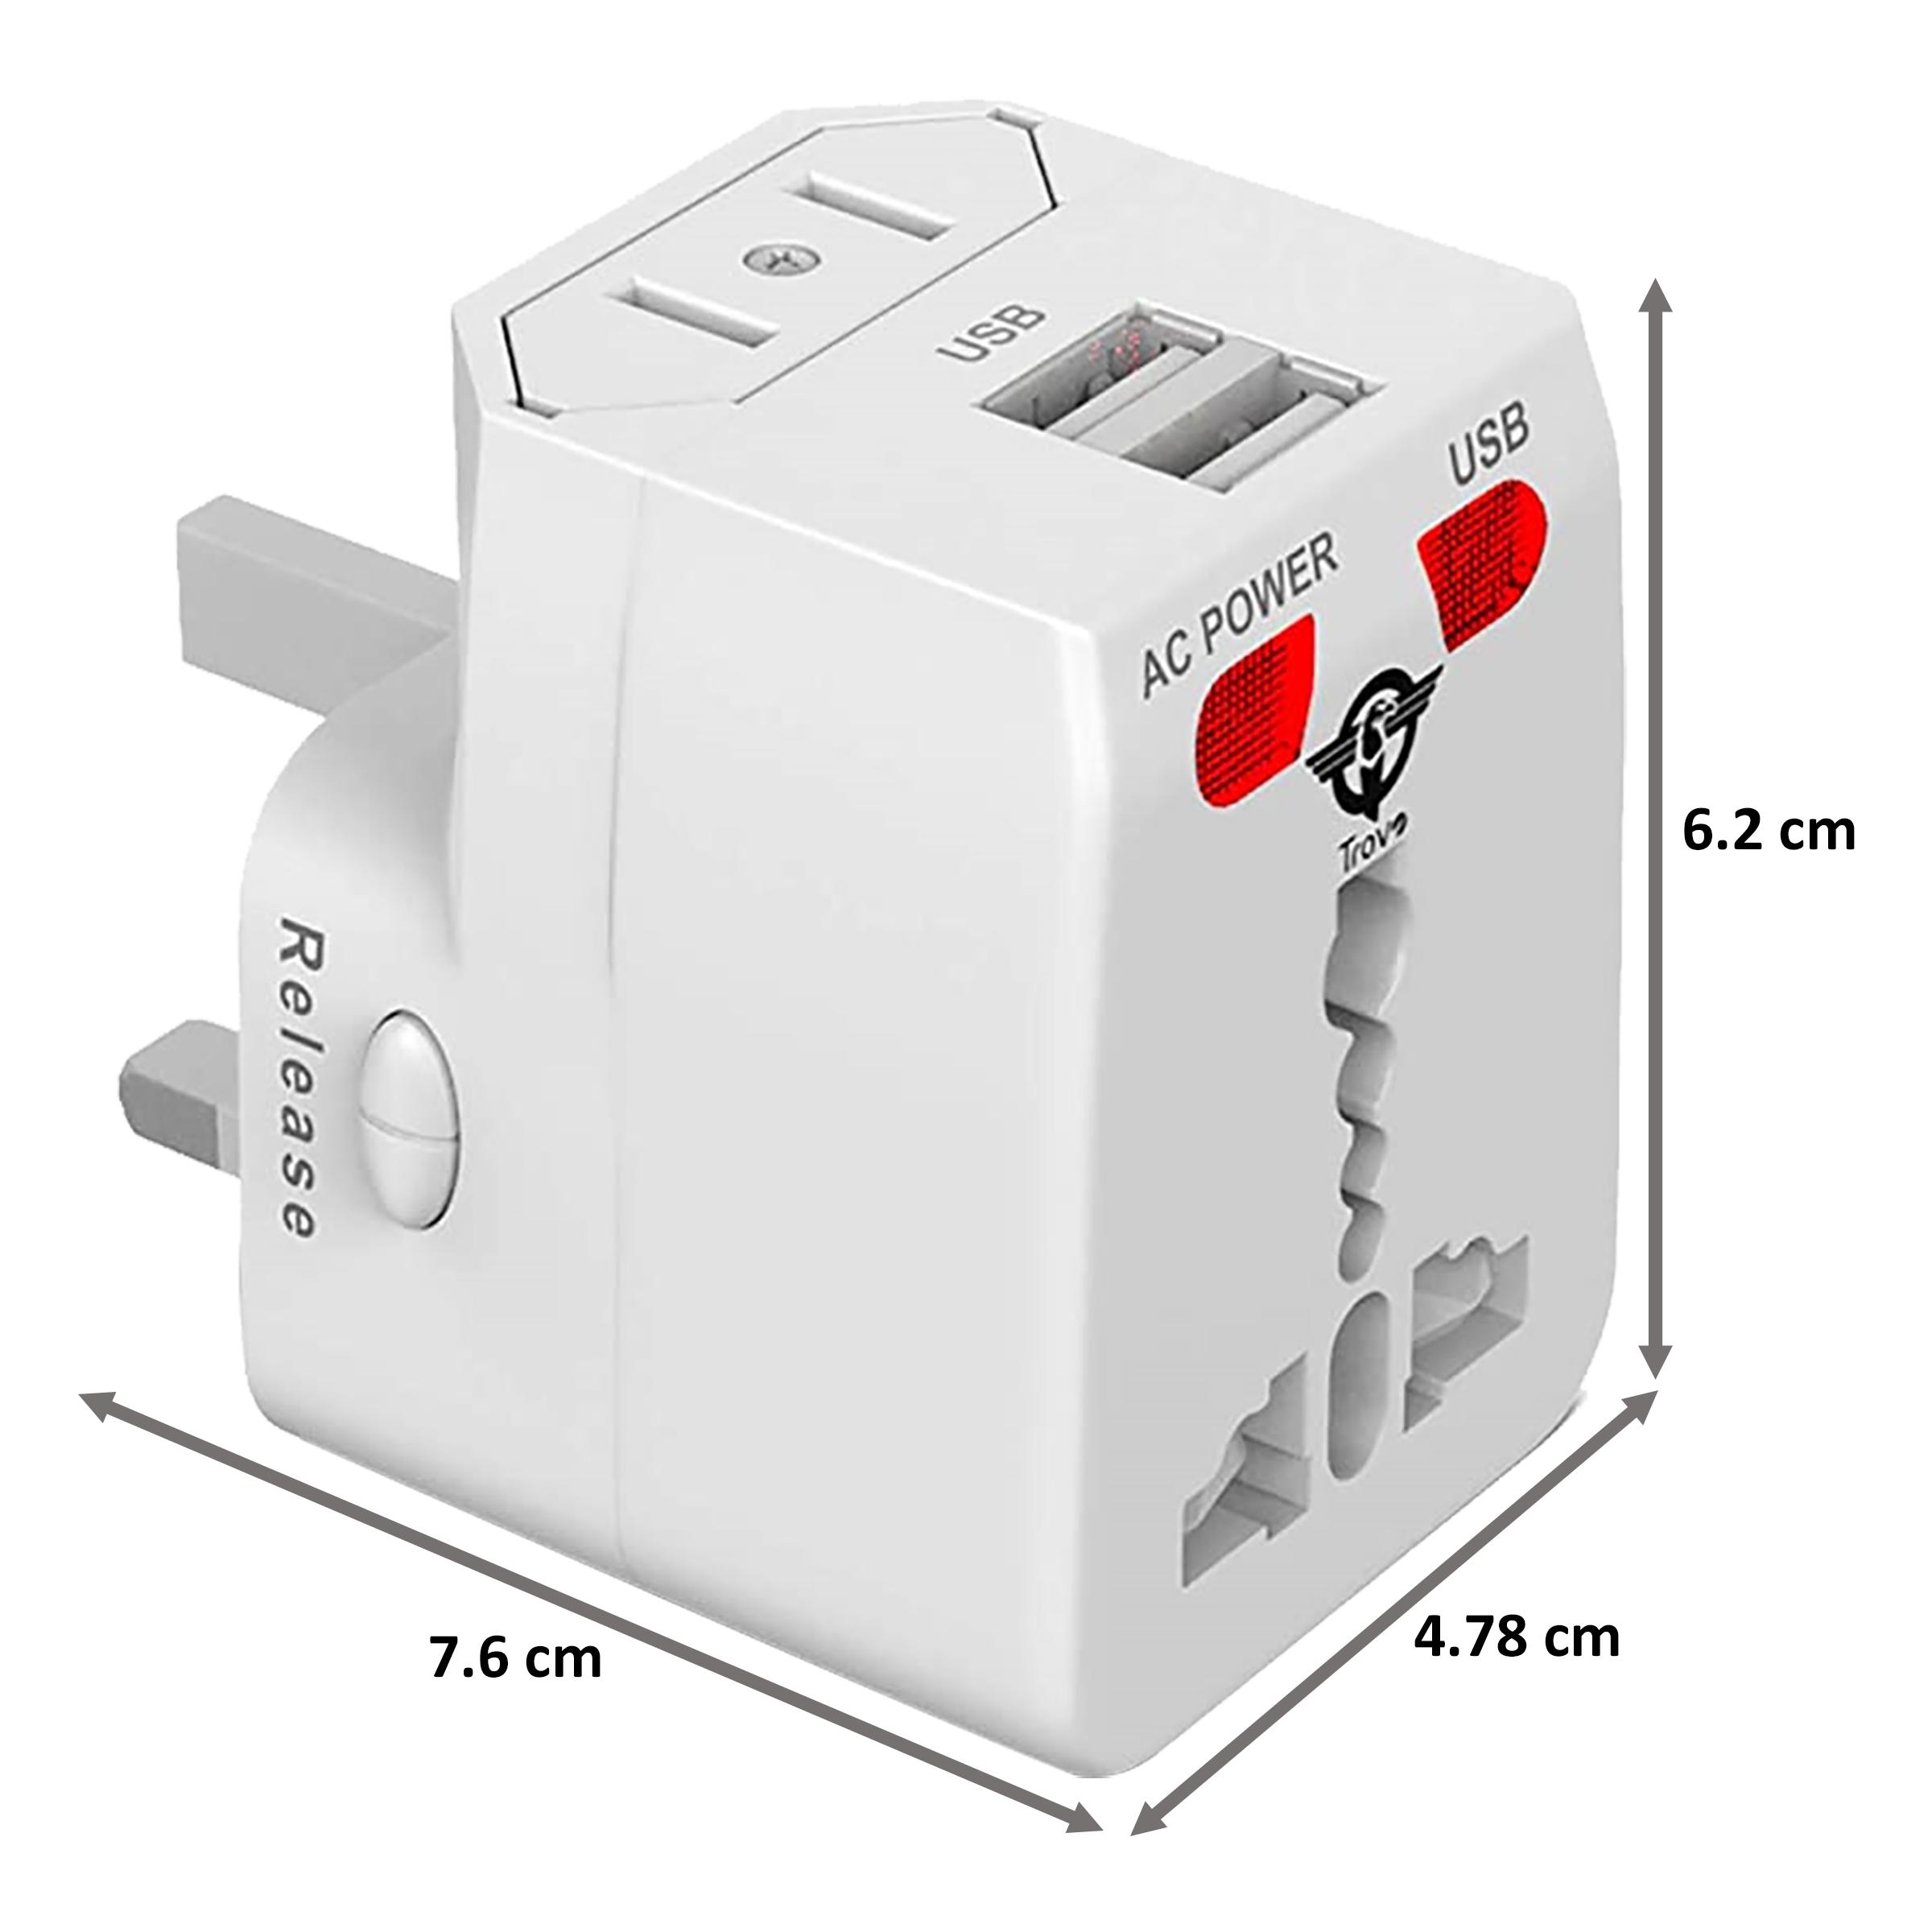 Trovo Plug Pack Lite 3 Plugs Adapter (Dual USB Ports, TTA-11, White)_2